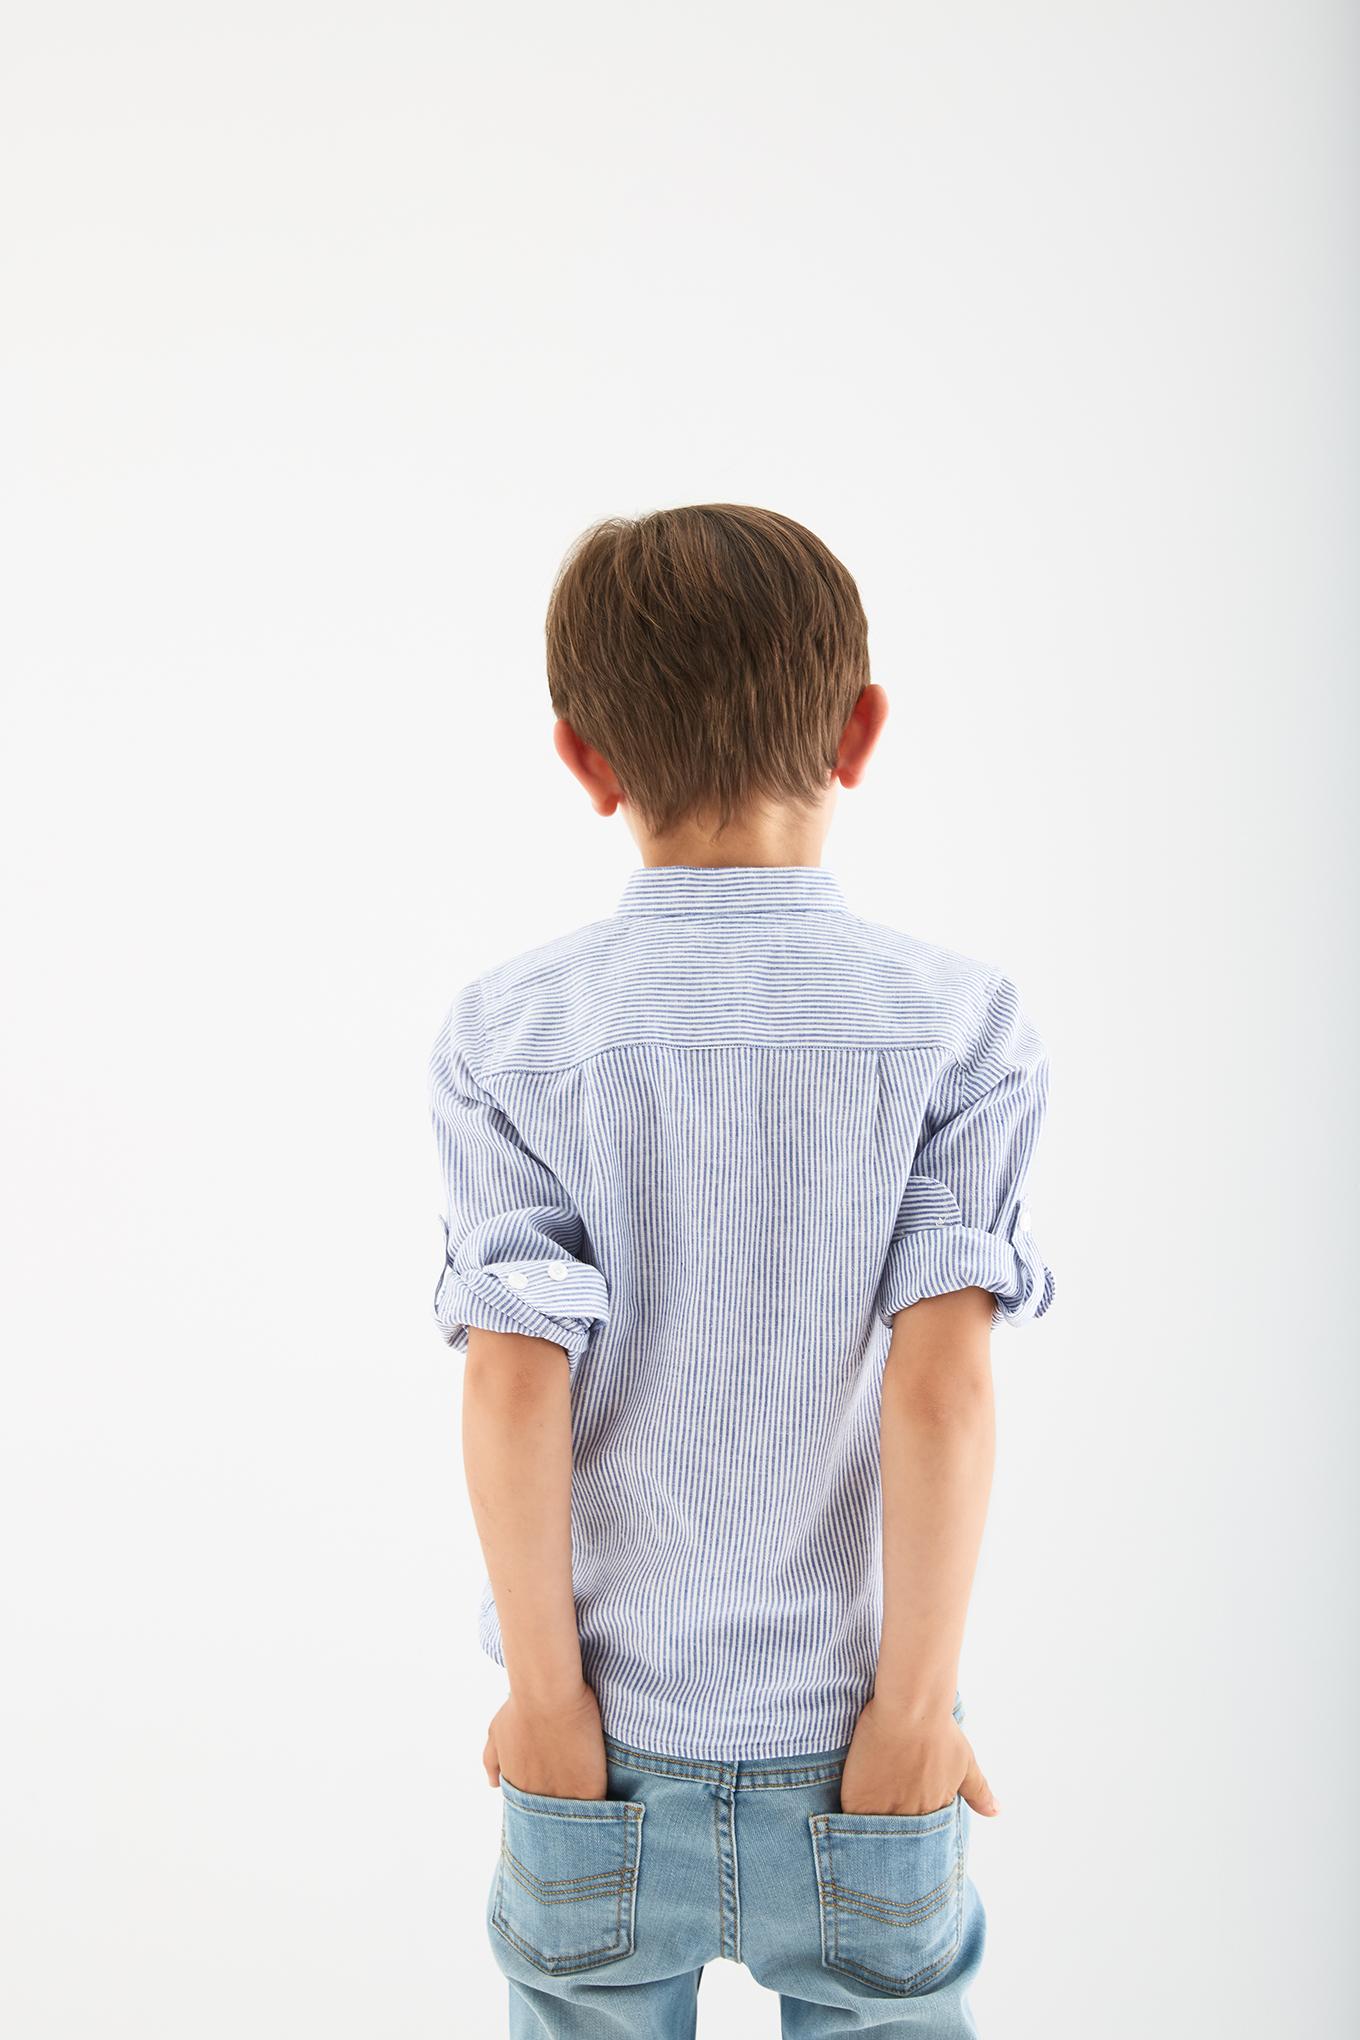 Shirt Stripes Casual Boy